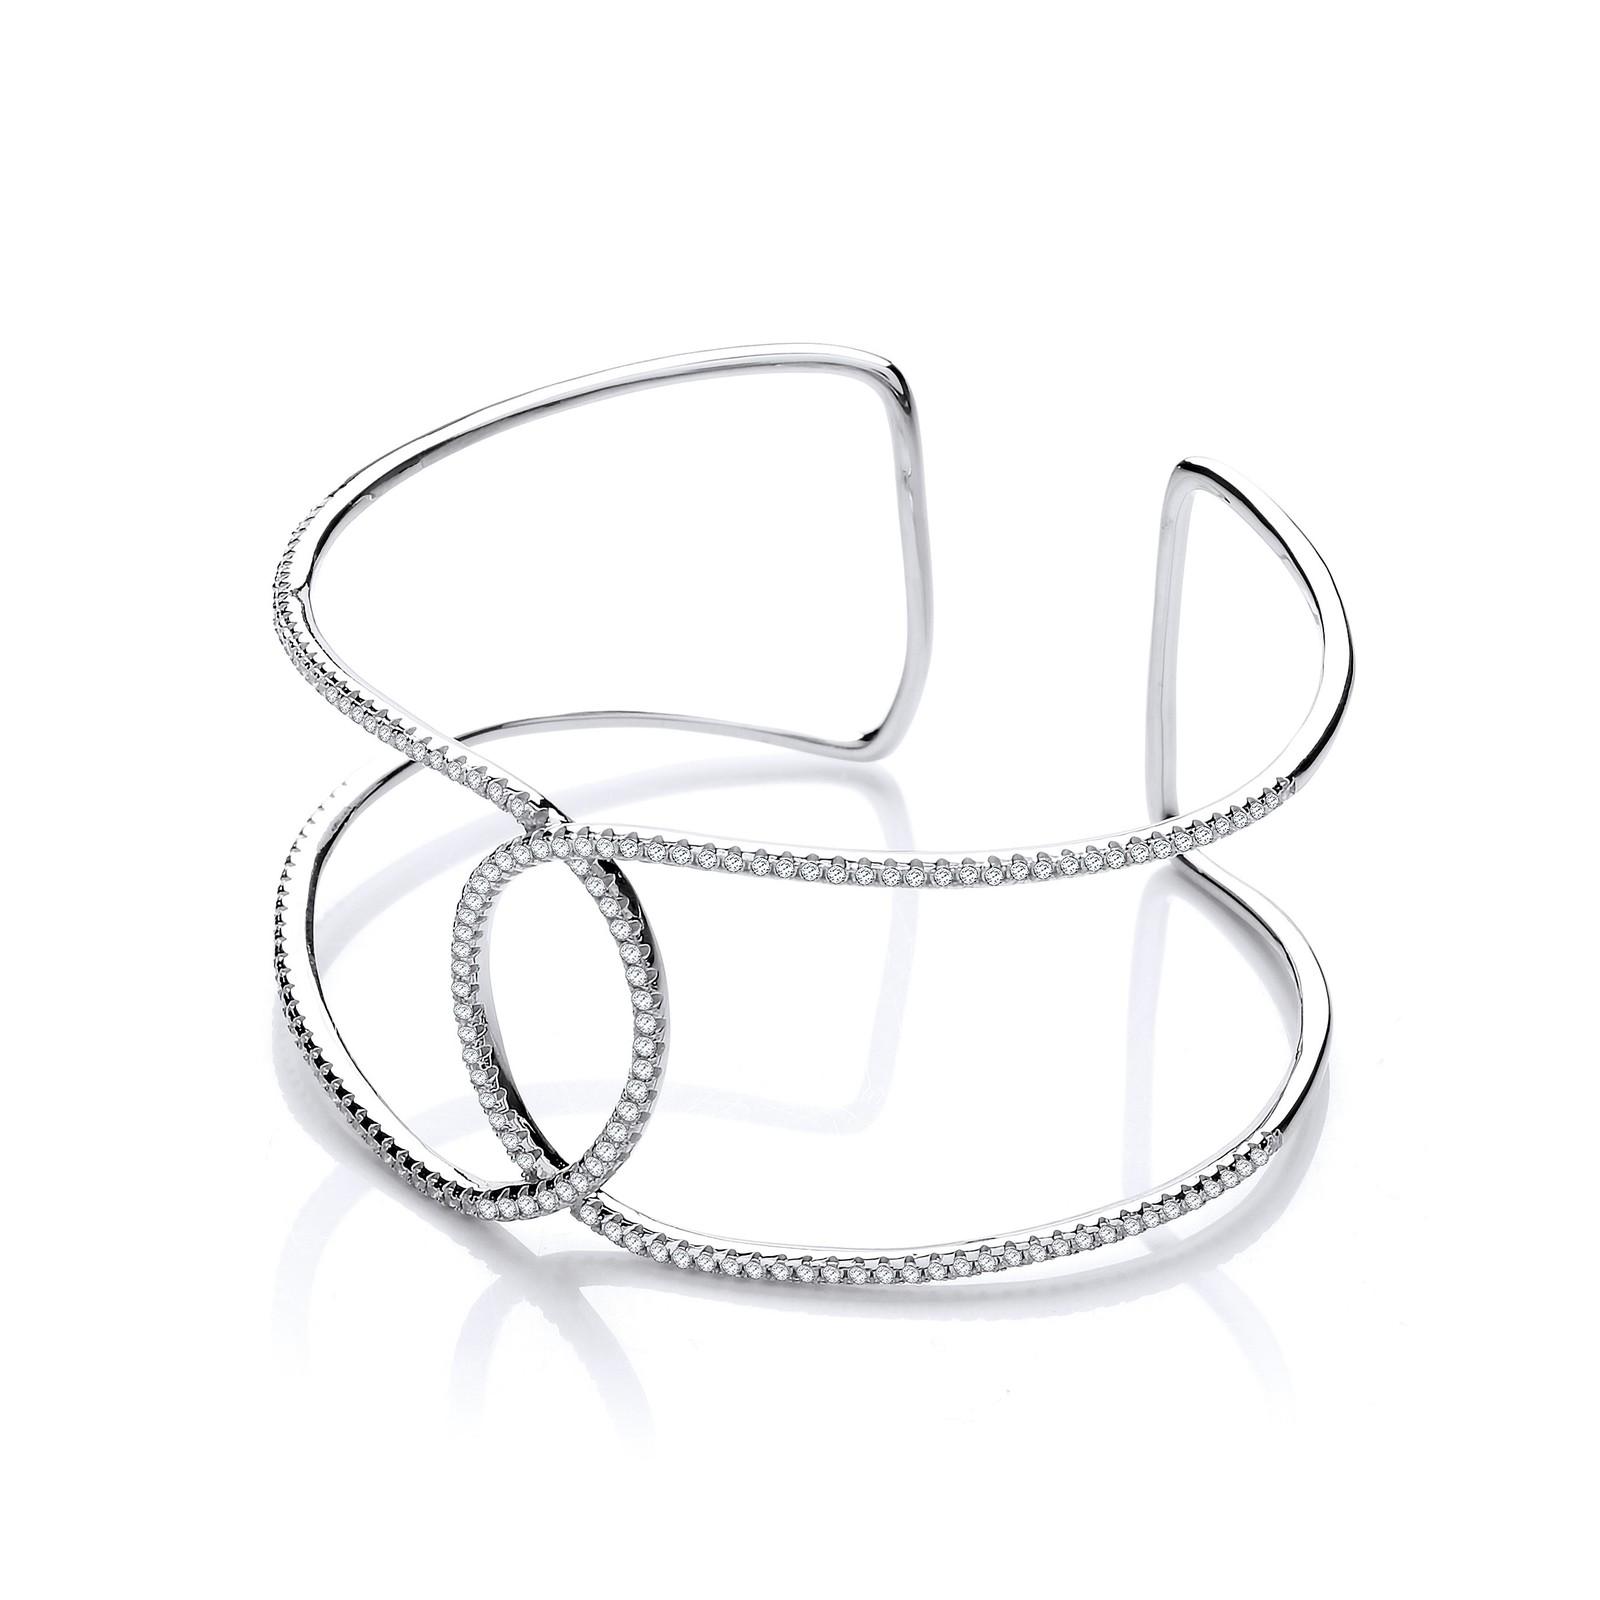 Micro Pave' Two Row Cz Interlocking Cuff Silver Bangle